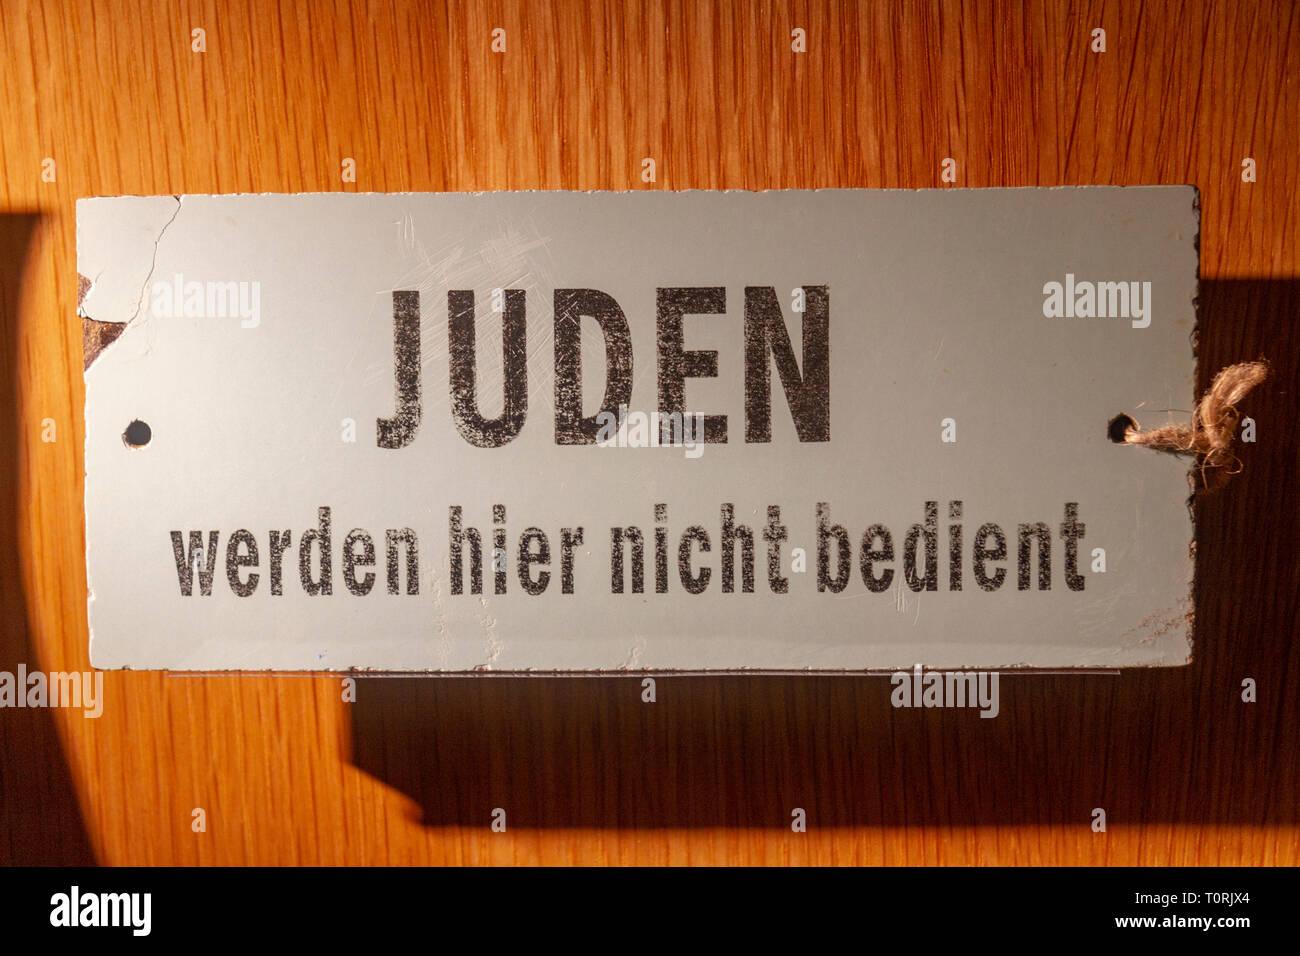 German notice banning Jews from entering an establishment, Mémorial de Caen (Caen Memorial), Normandy, France. - Stock Image